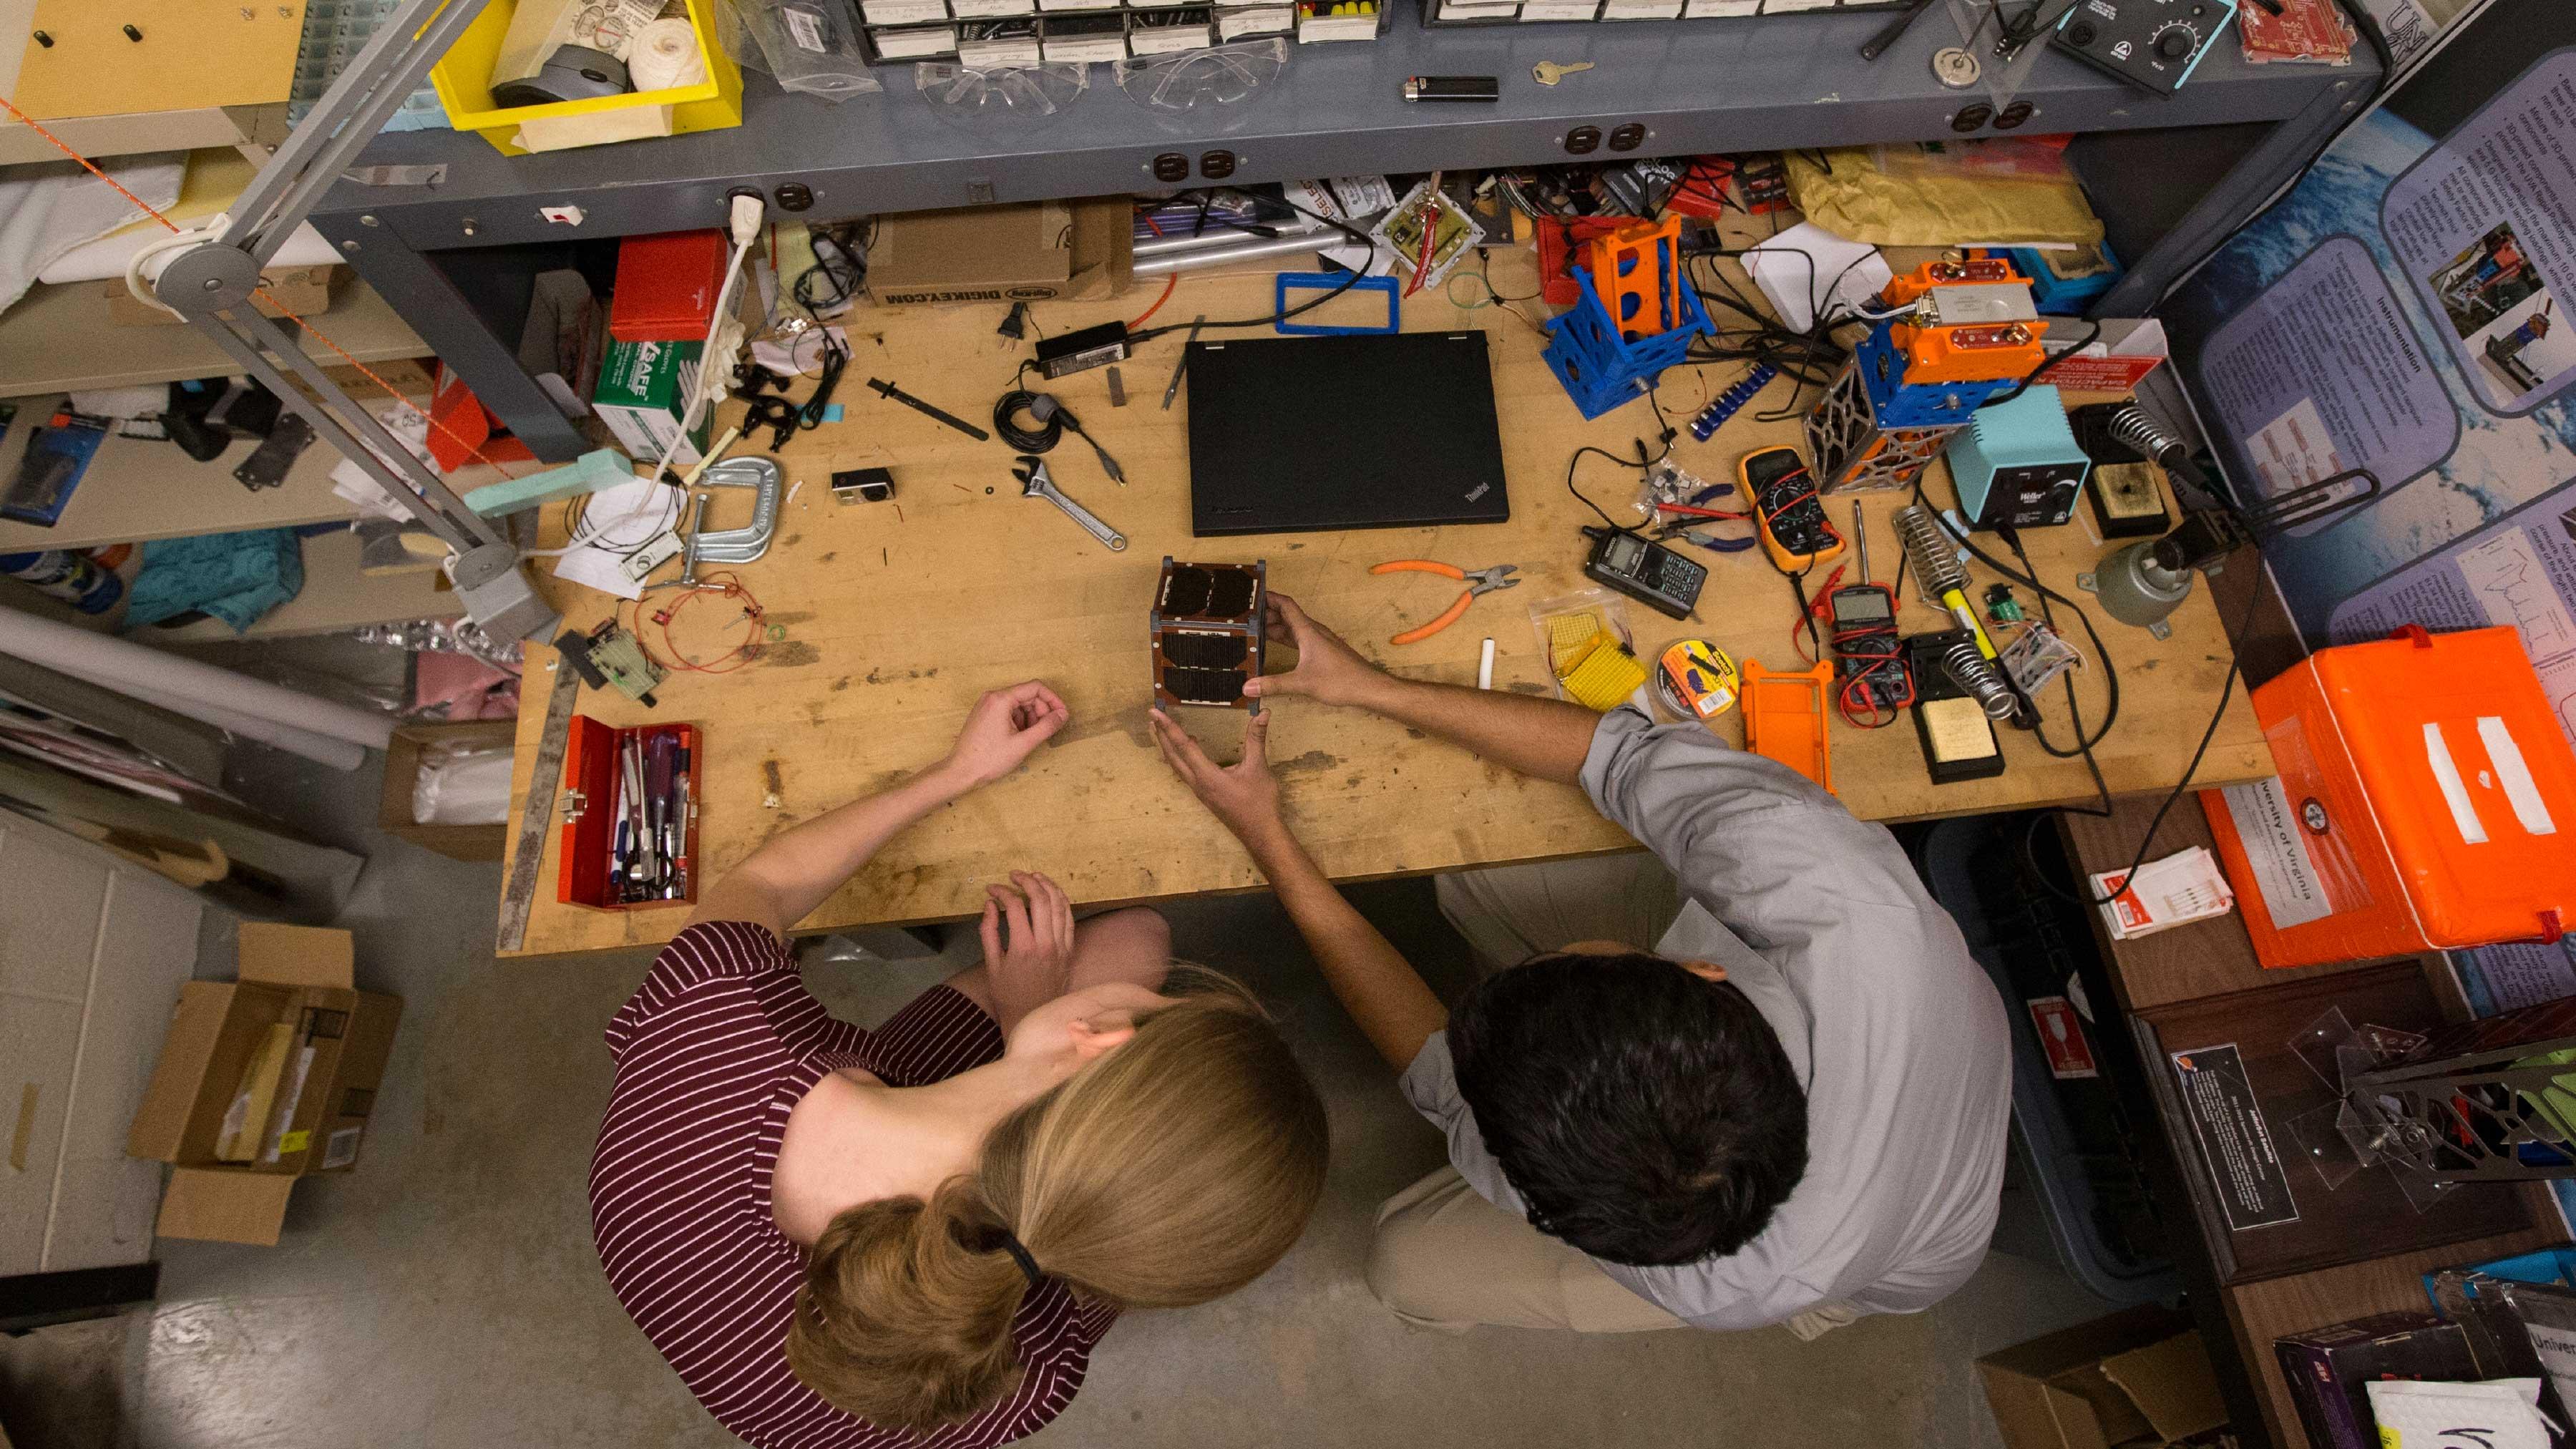 Leiter and Venigalla construct a CubeSat mockup.